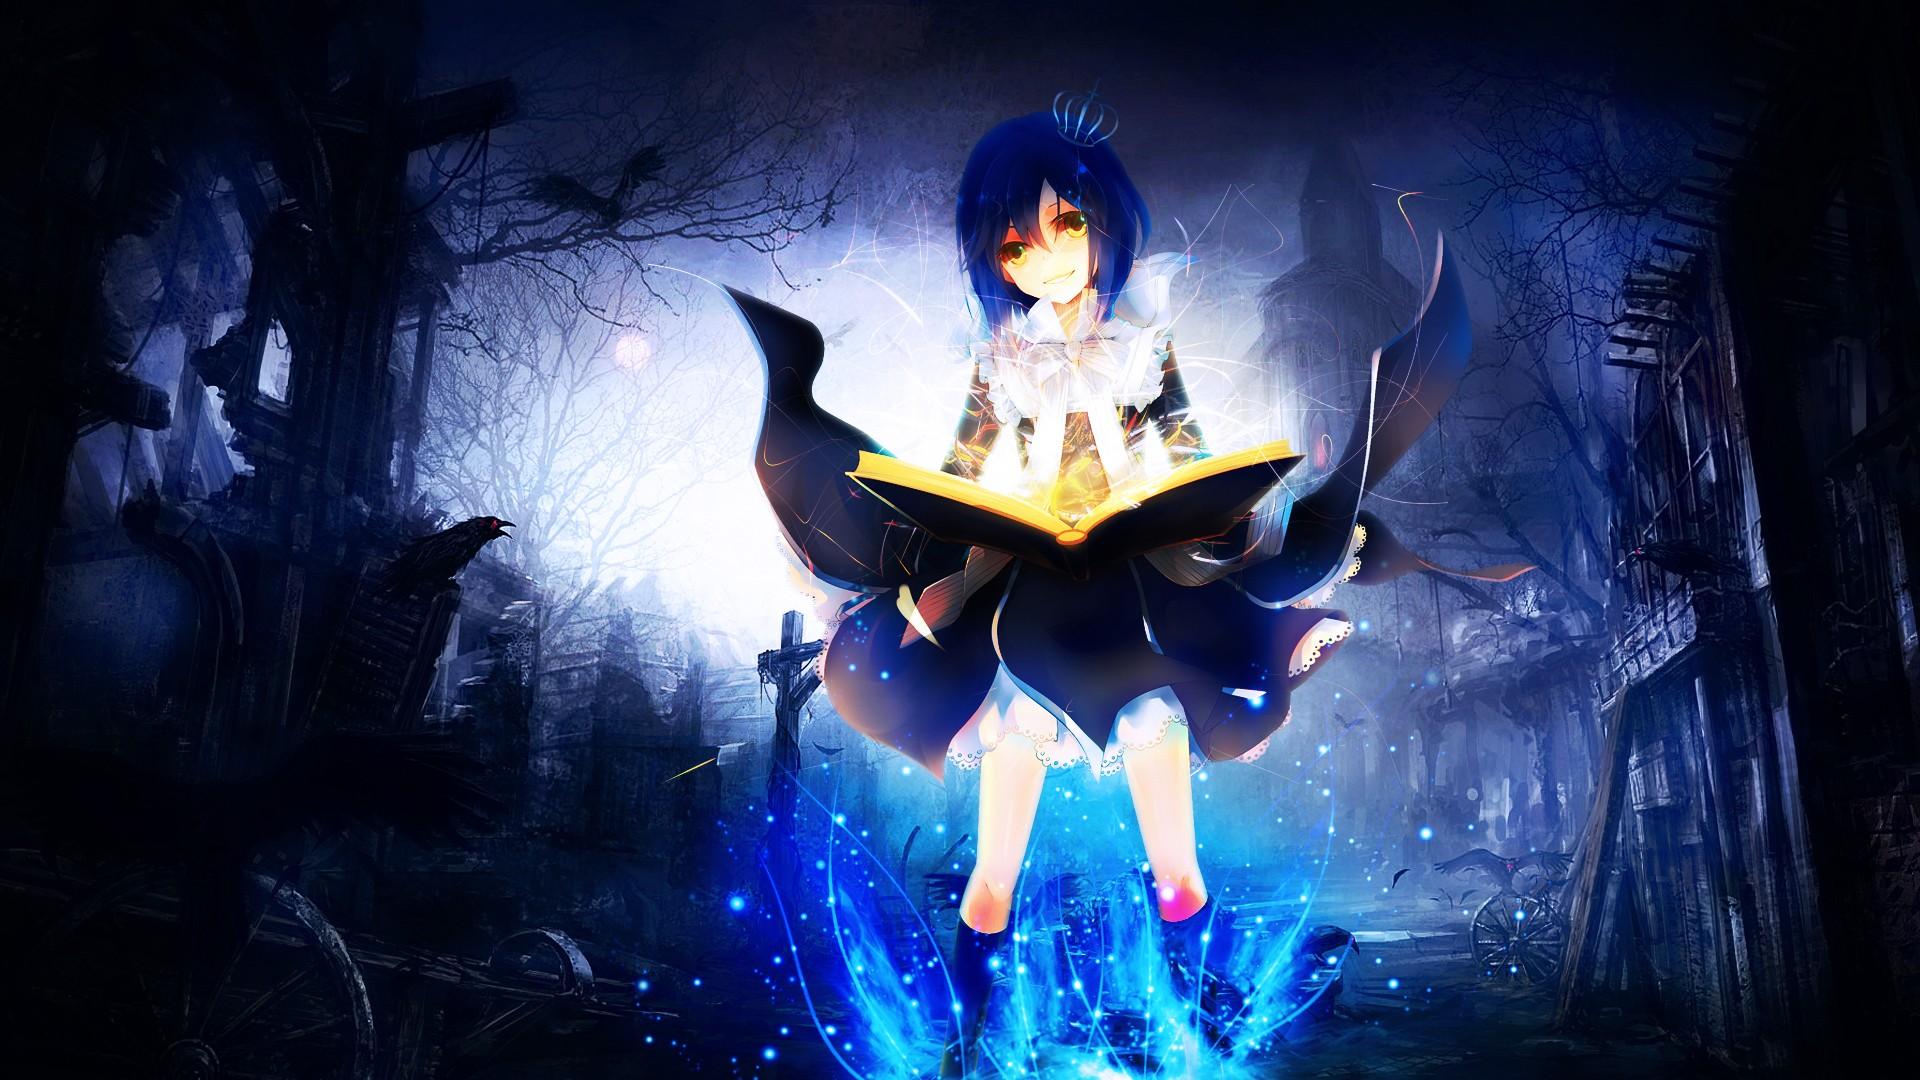 Anime Girl With Magic wallpaper   821742 1920x1080